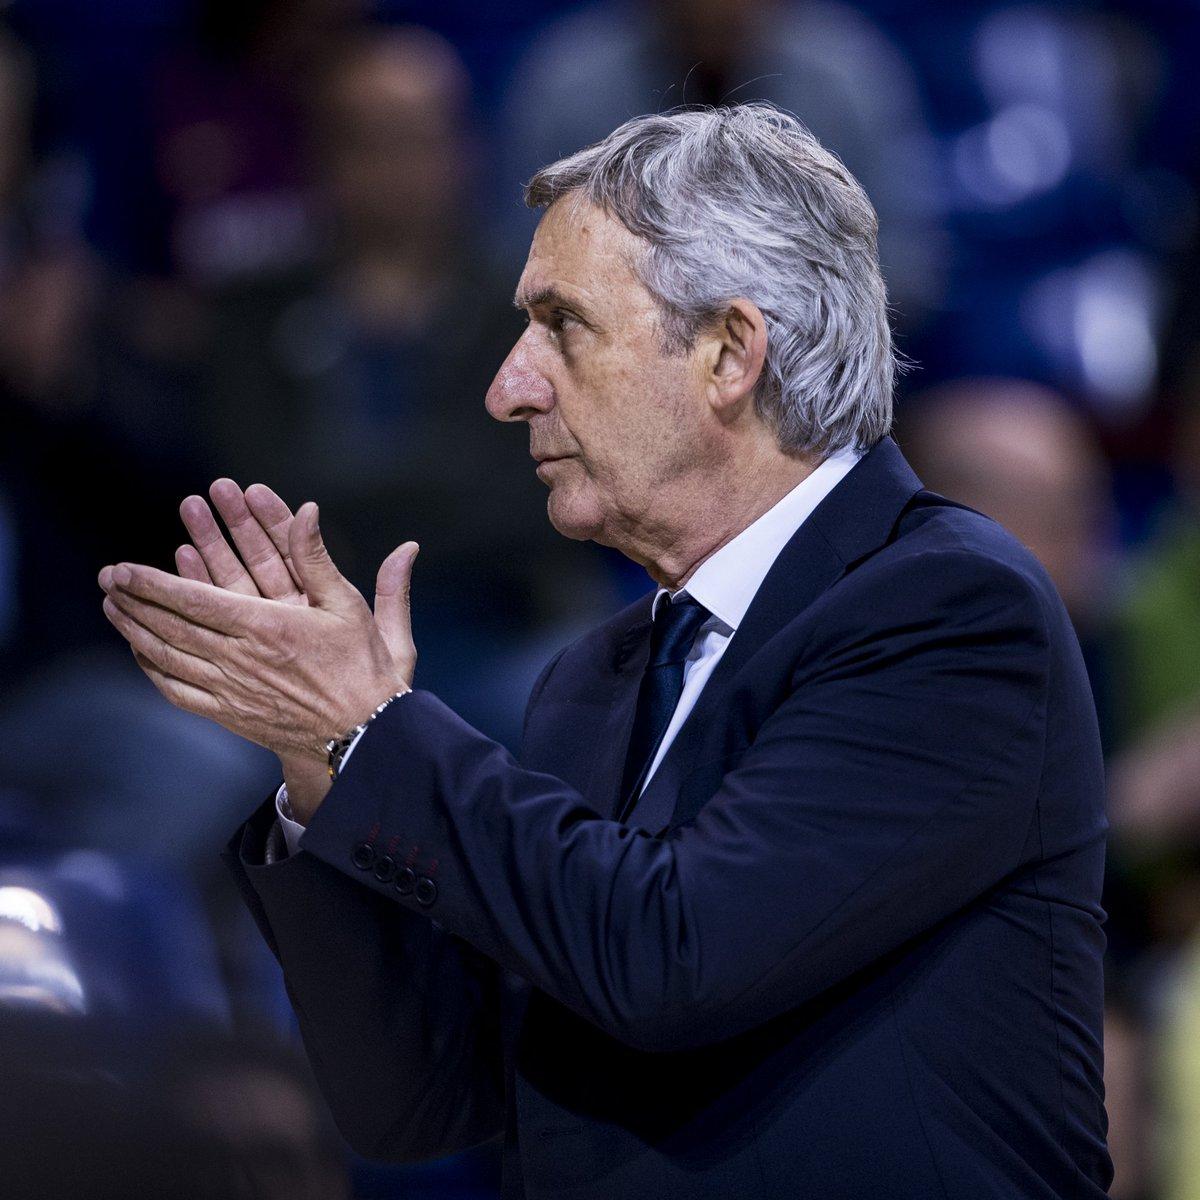 🏀 La prèvia del @fcb_basketball - @FCBbasket que disputarem demà dijous, a les 20h, a l'Audi Dome de Munic  http://ow.ly/ZOAJ30o7NI7   🔵🔴 #ForçaBarça!